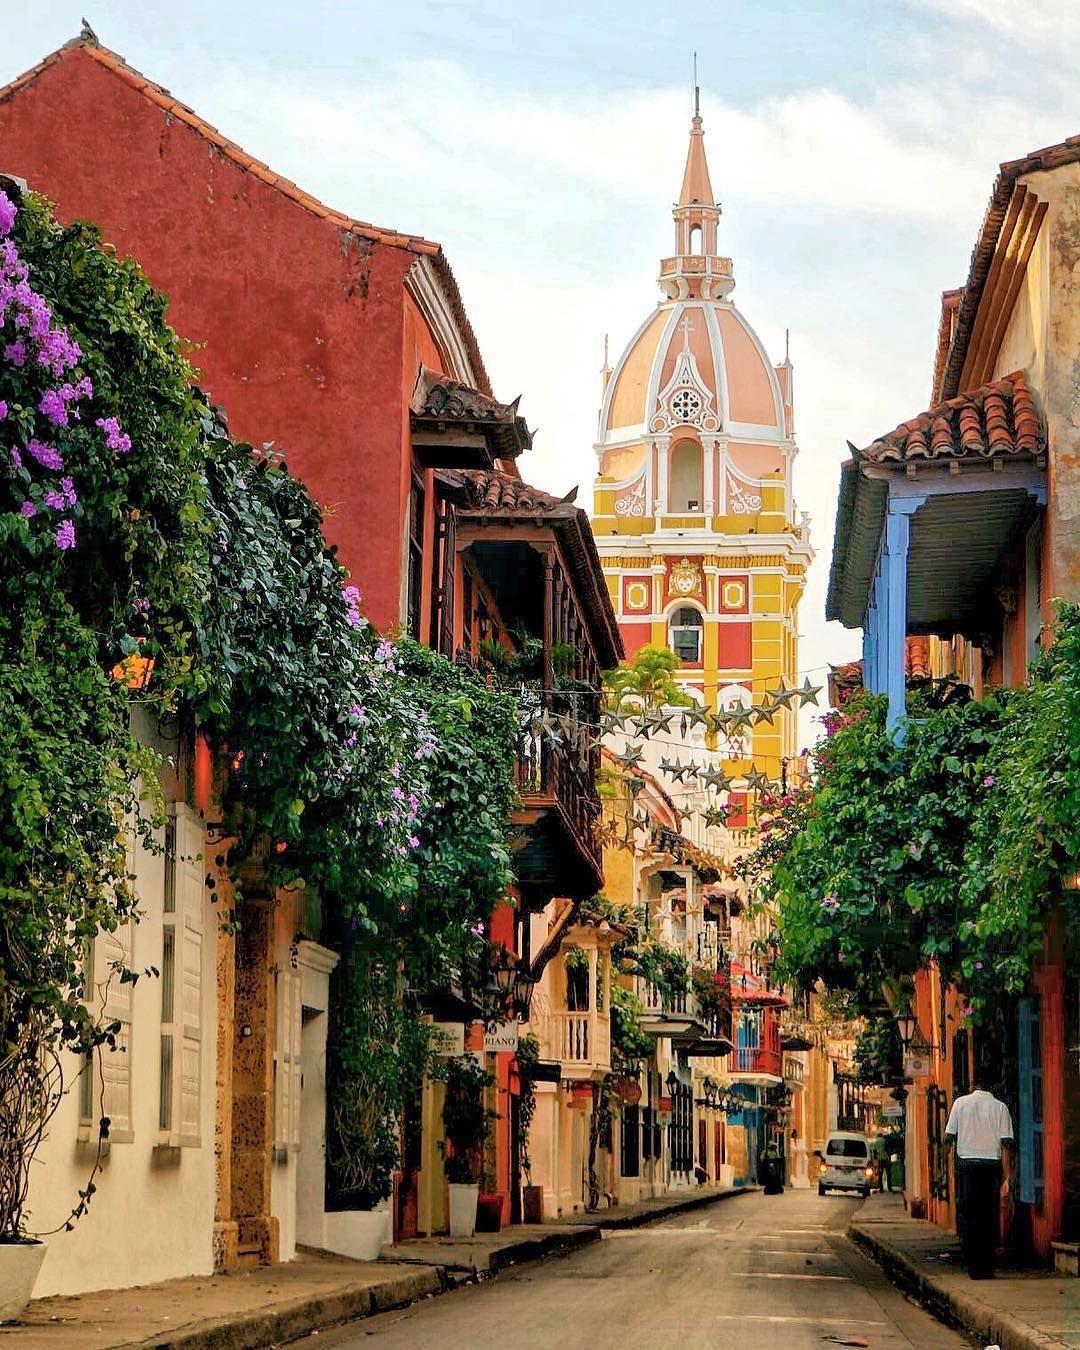 Visitsouthamerica Co Cartagena De Indias Colombia Photo By Whereivebeenwandering